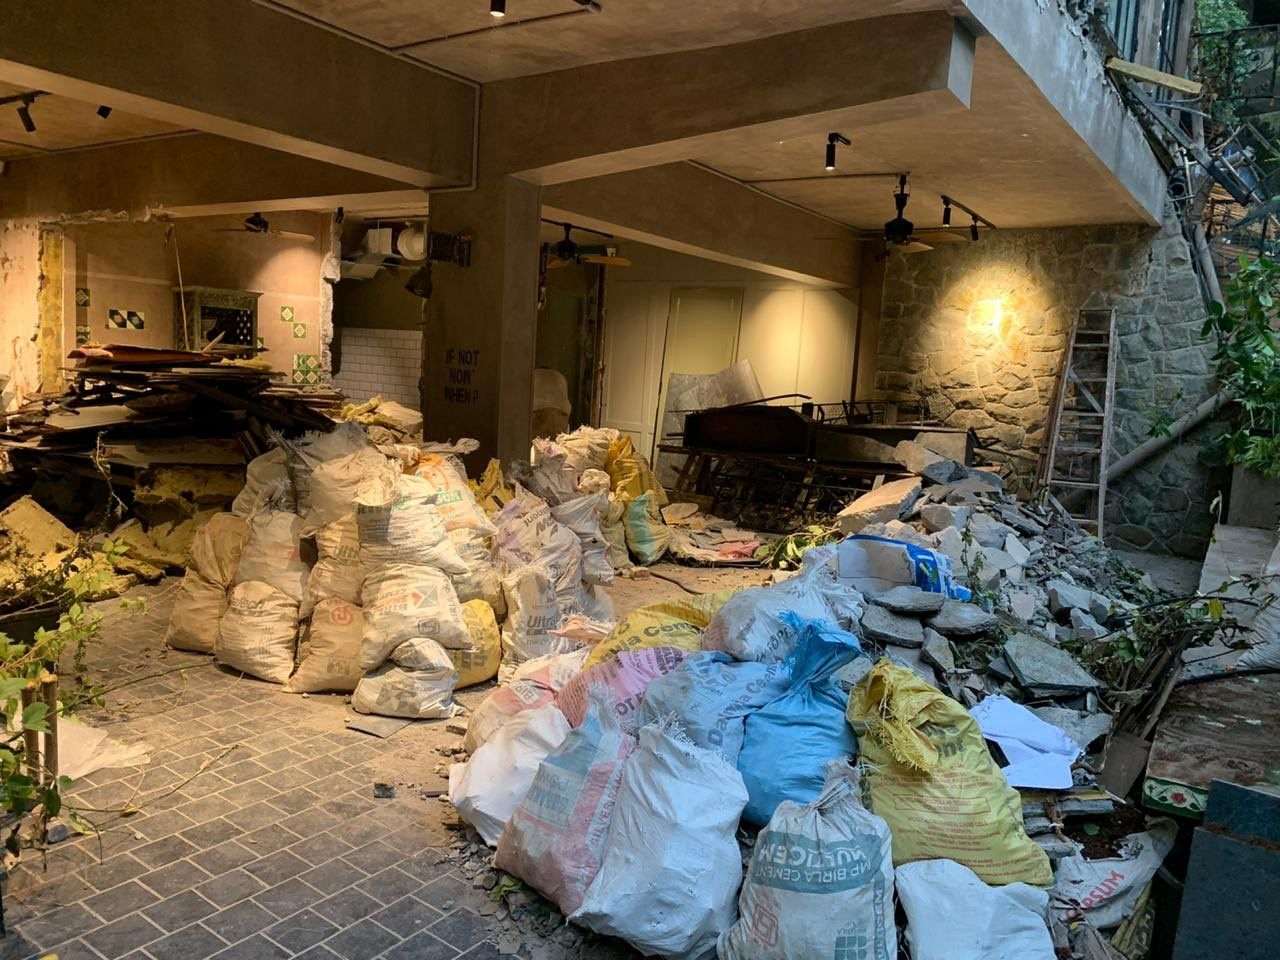 Kangana Ranaut demolished office pics